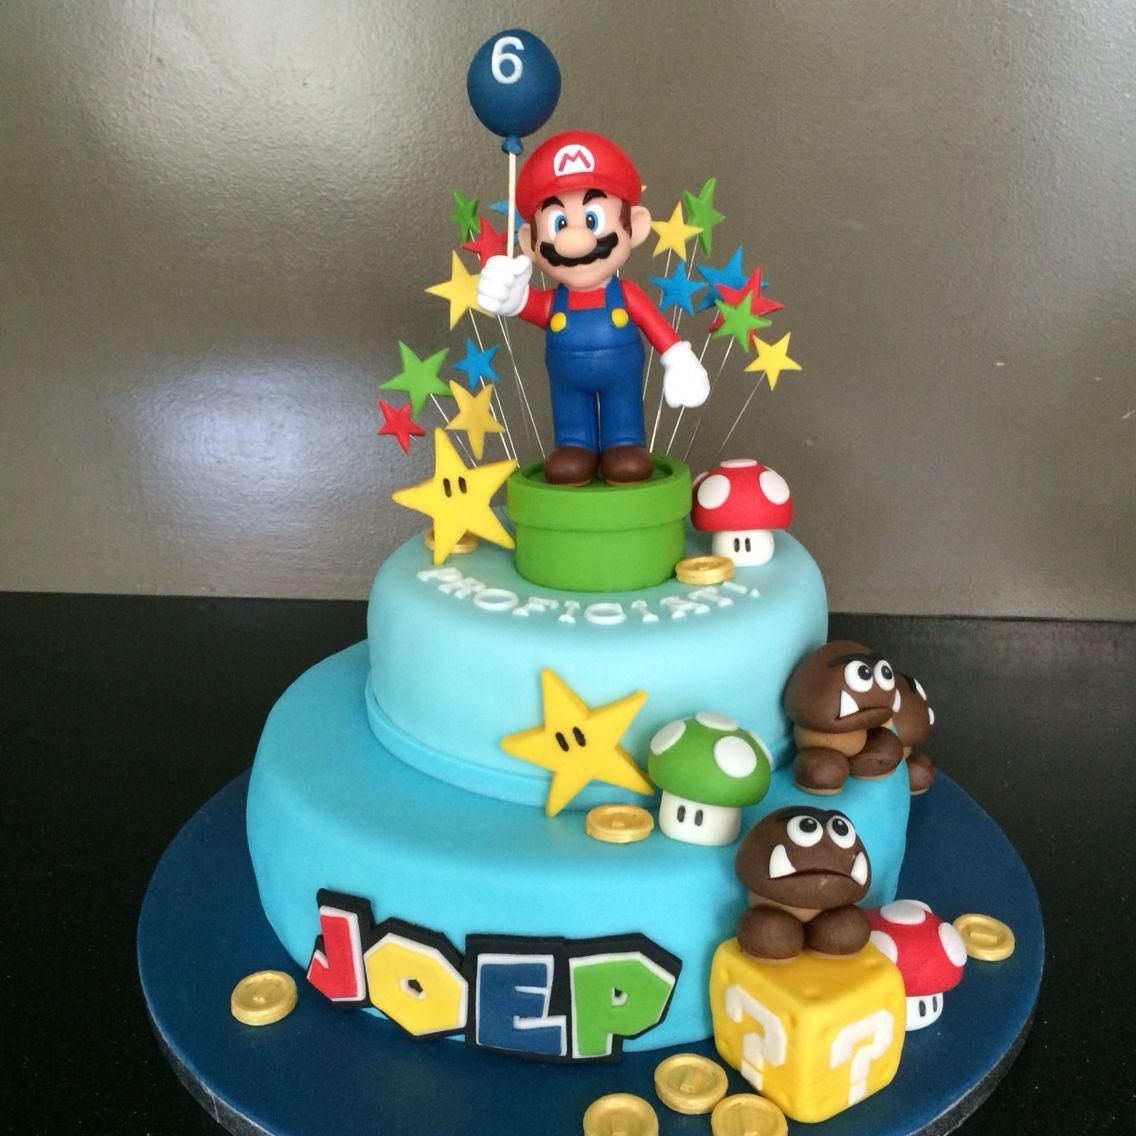 super mario taart Super Mario taart | Mario in 2018 | Pinterest | Mario bros, Cake  super mario taart